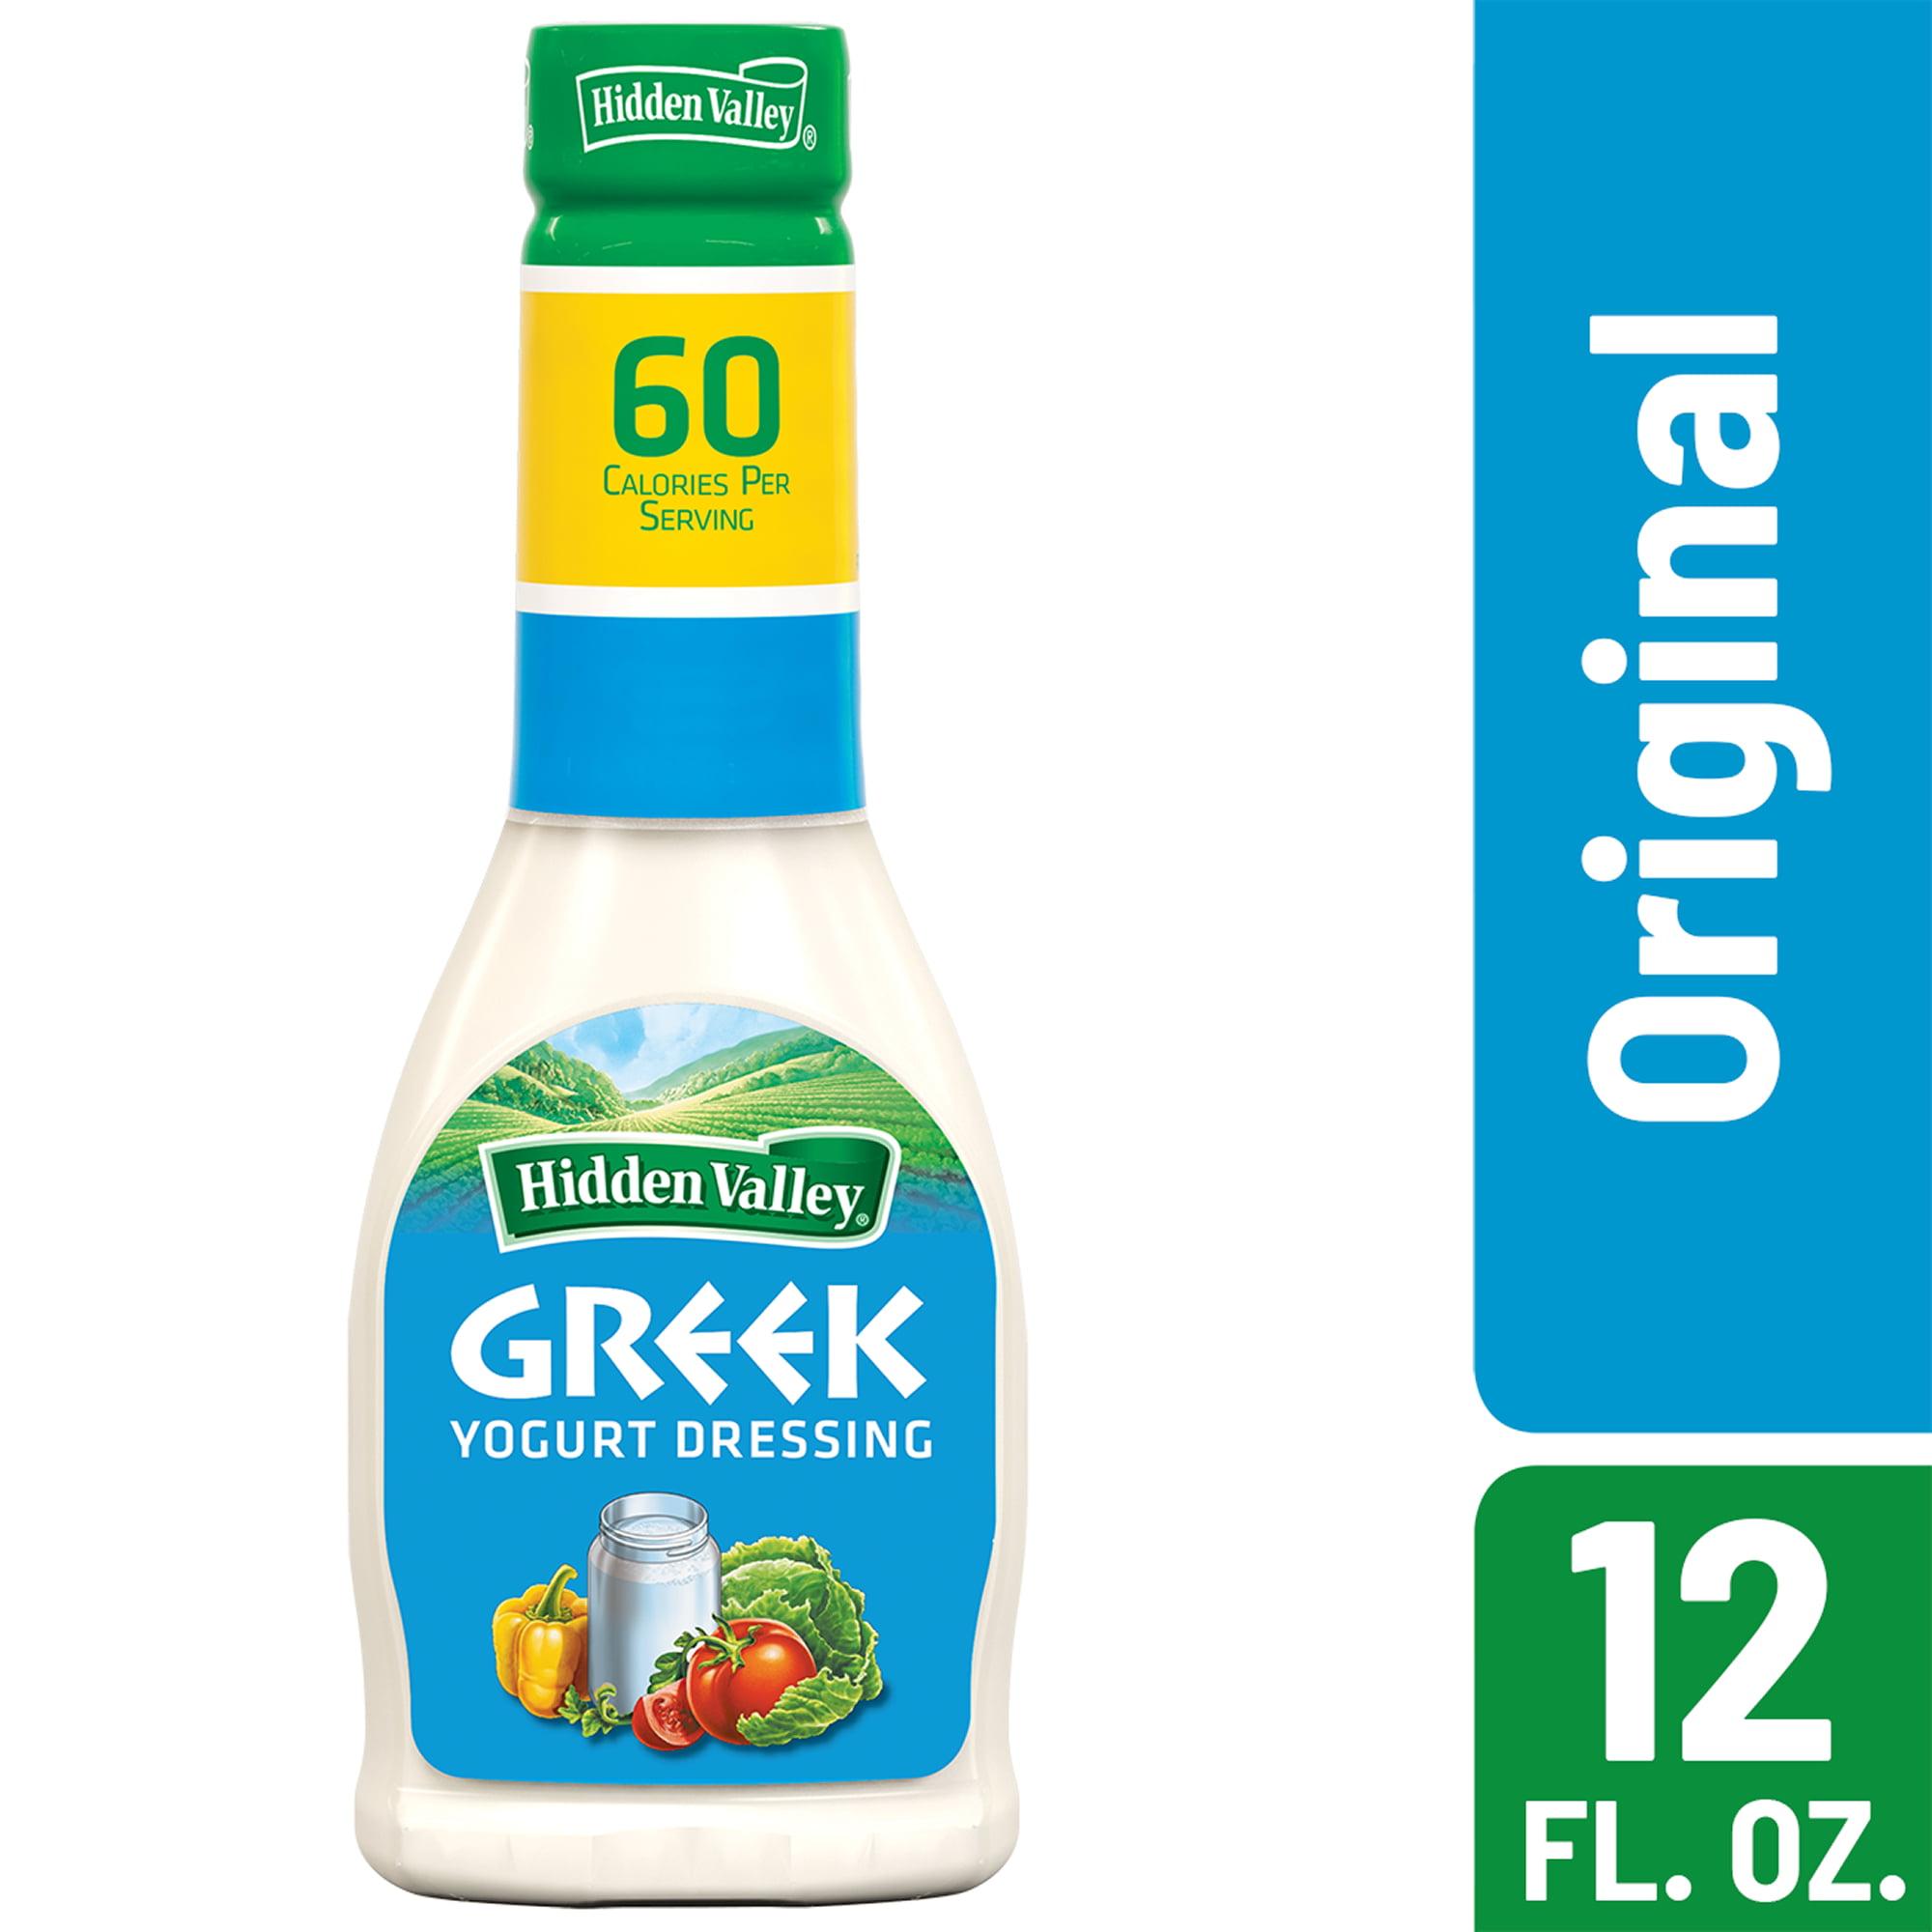 (2 Pack) Hidden Valley Greek Yogurt Original Ranch Salad Dressing & Topping, Gluten Free - 12 Oz Bottle